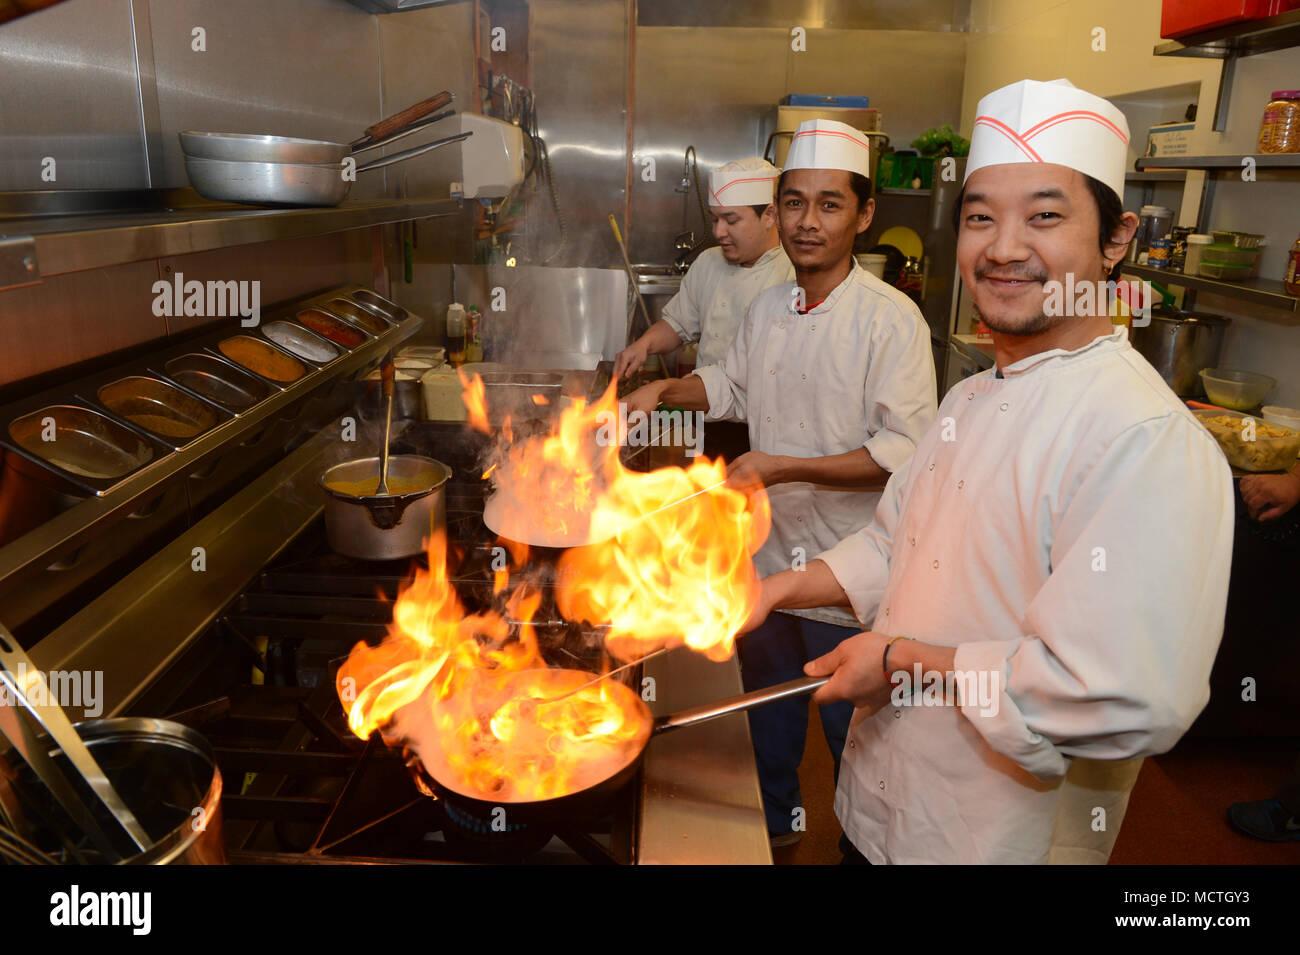 Chinese Takeaway Restaurant Stock Photos & Chinese Takeaway ...